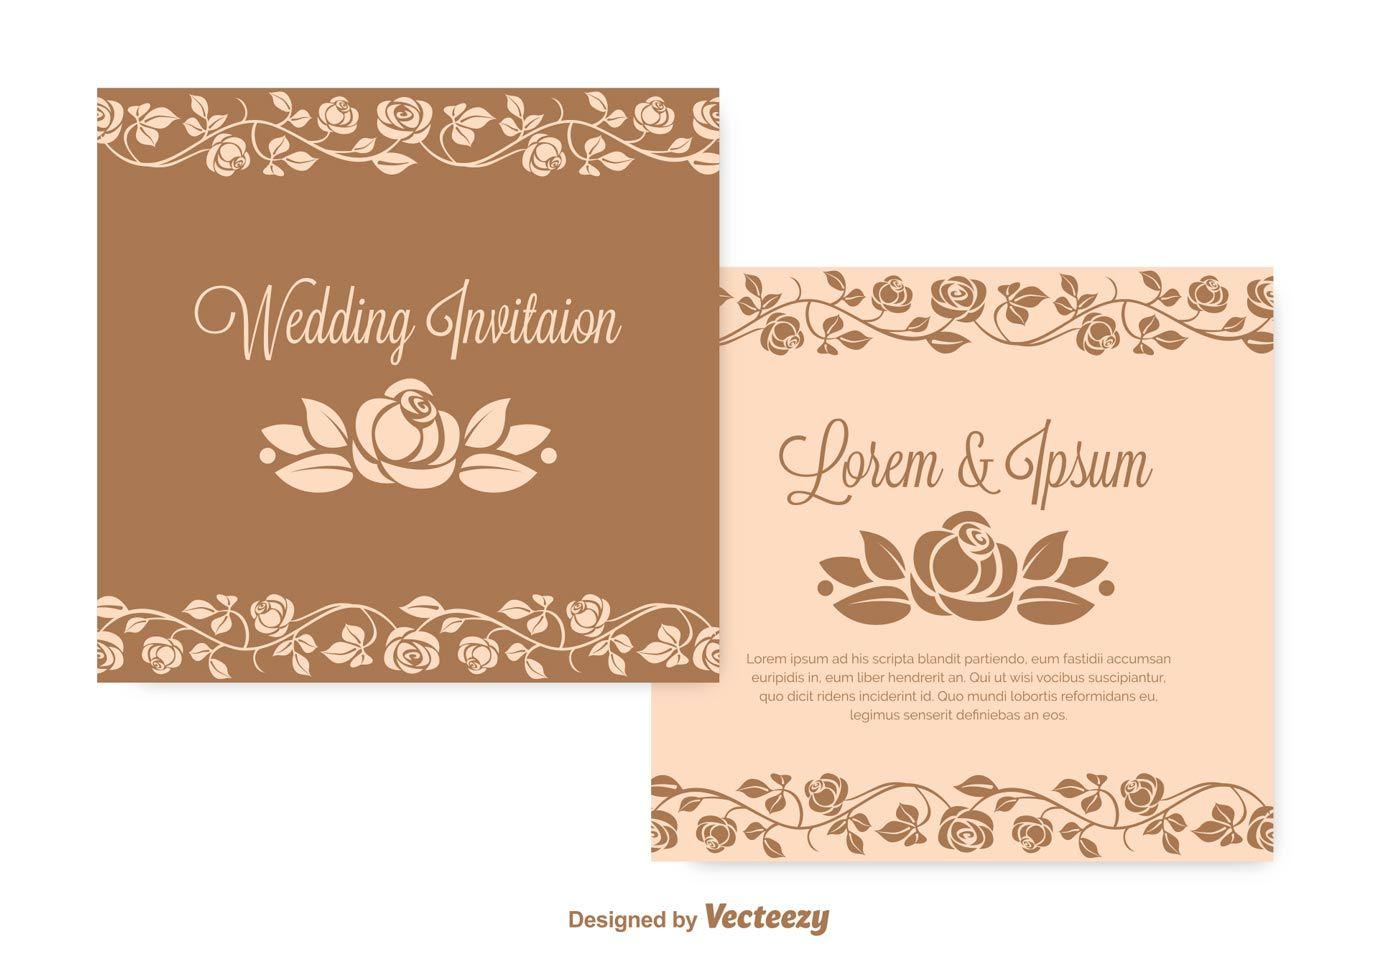 Wedding Invitation Vector Set Wedding Invitation Vector Vintage Wedding Invitations Templates Wedding Invitation Templates